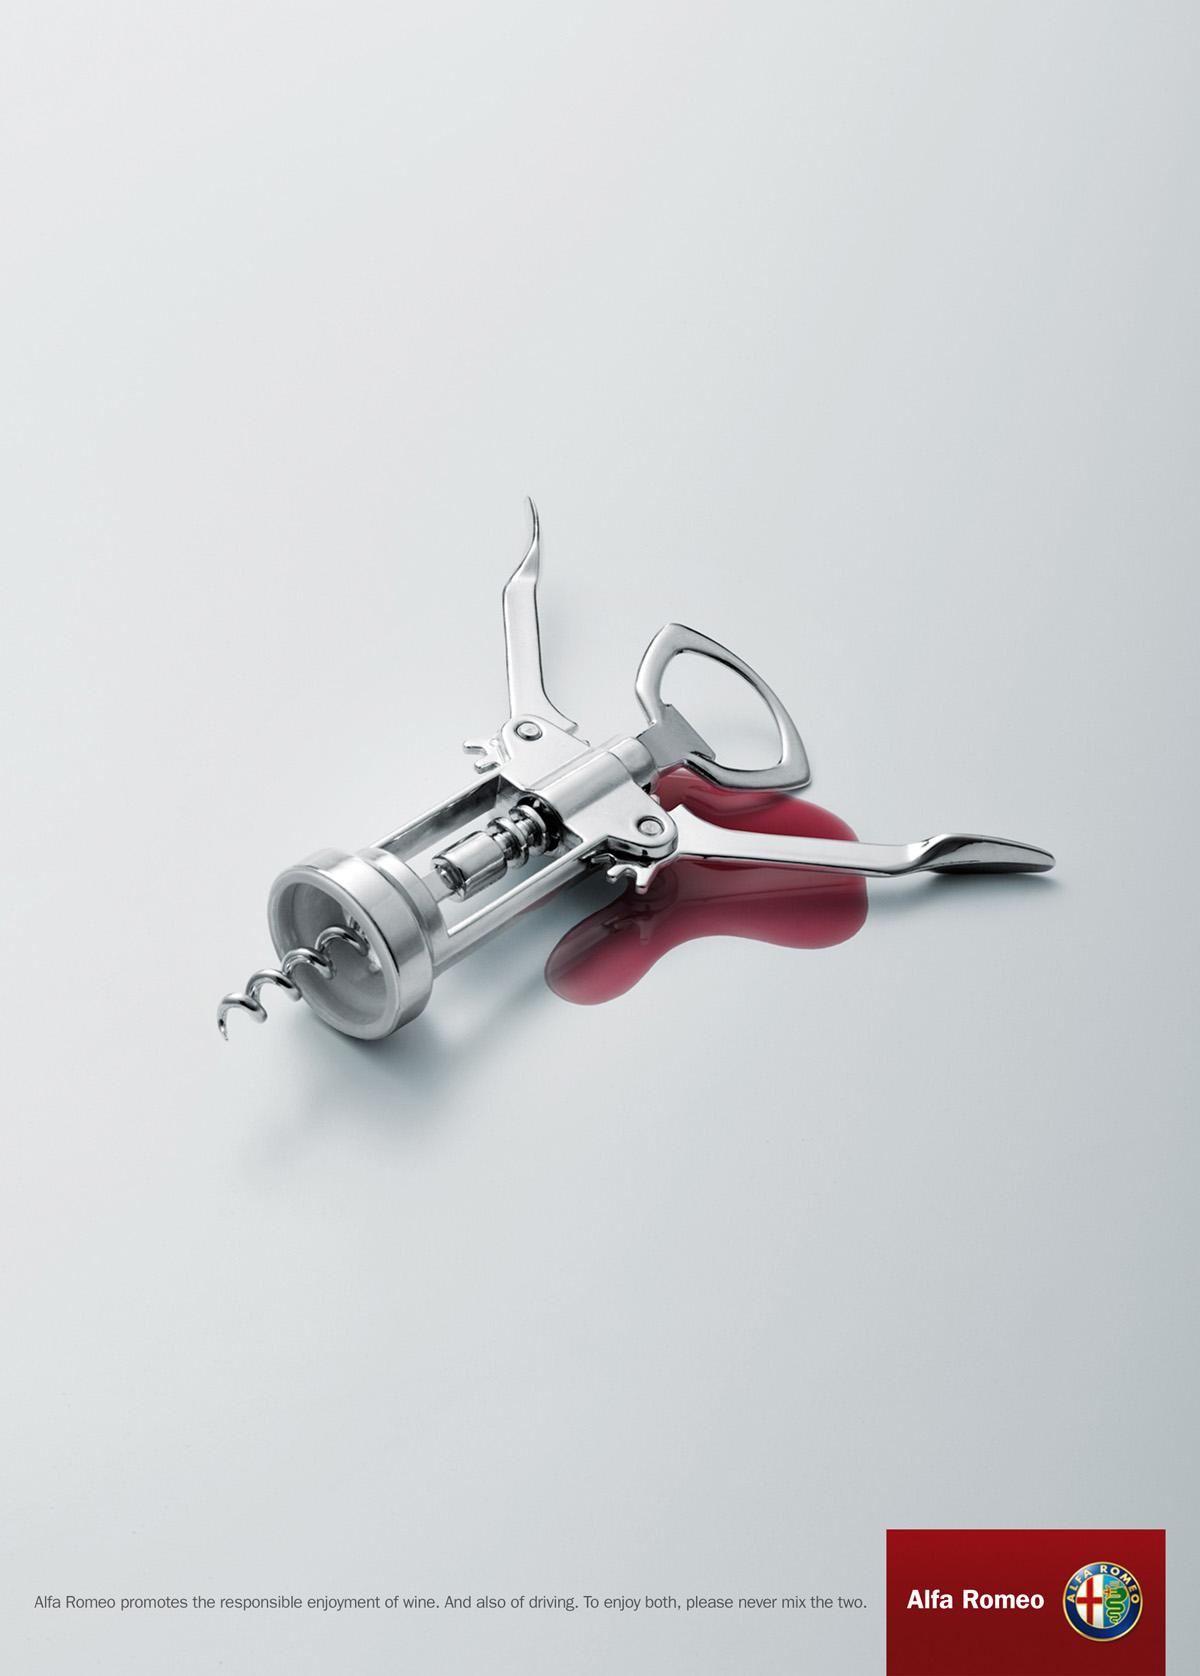 Alfa Romeo: